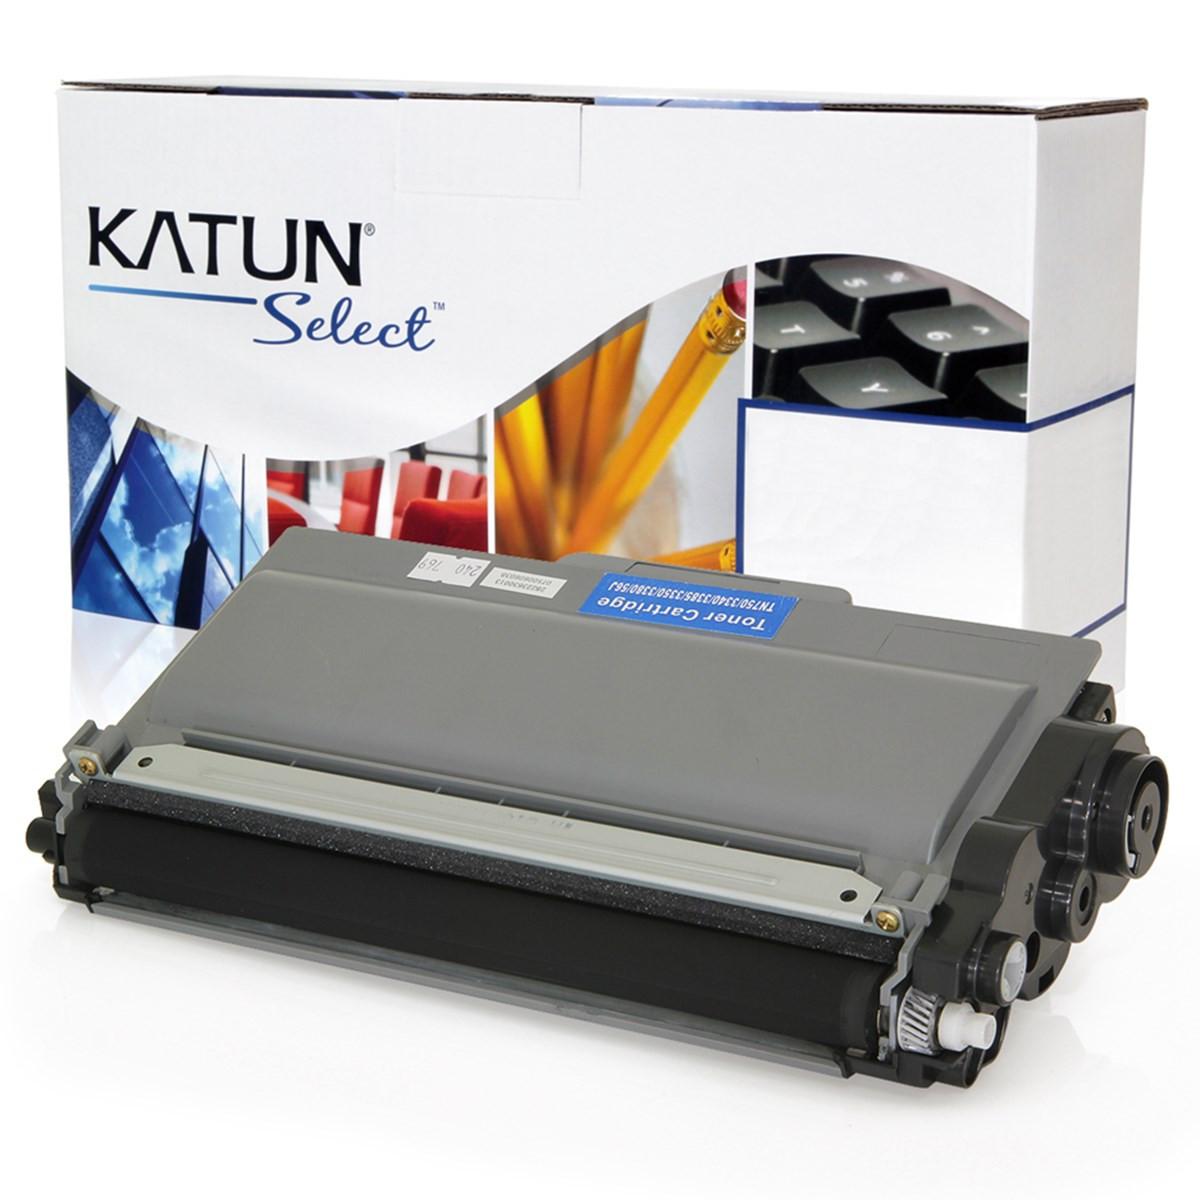 Toner Brother TN720 TN750 | DCP-8110DN DCP-8150DN HL-5450DW HL-5470DW MFC-8510DN | Katun Select 8k